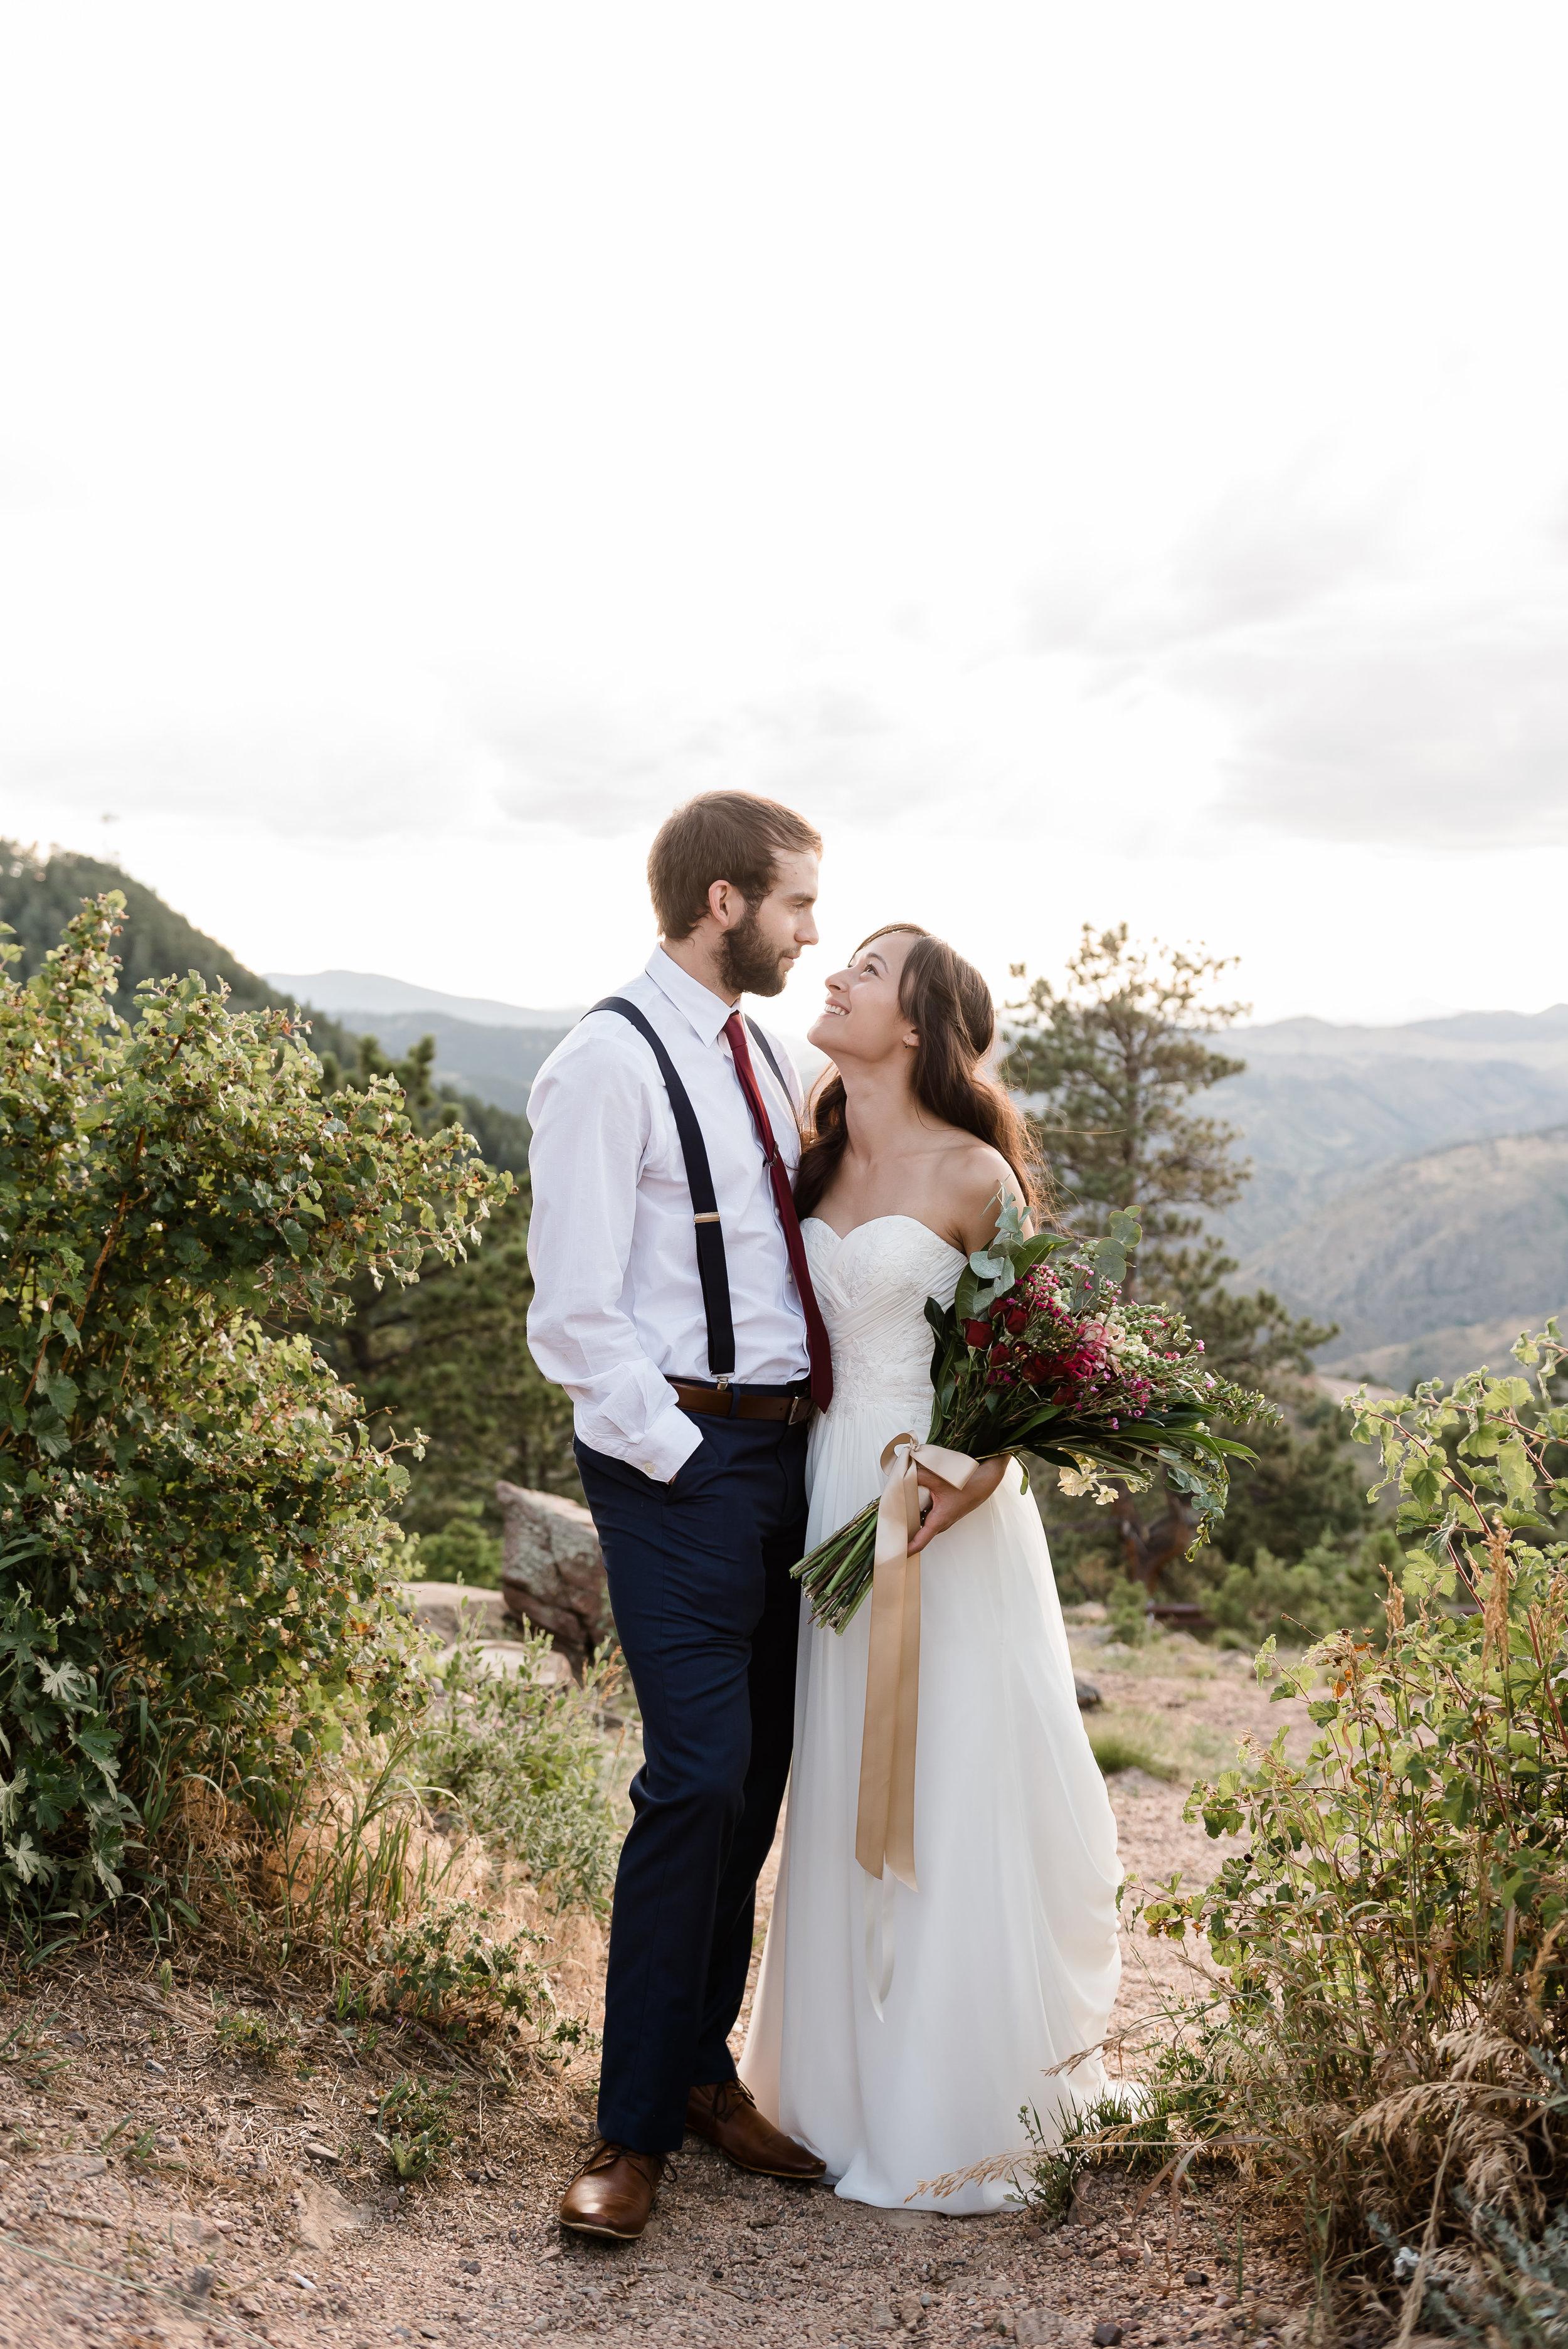 Tashina and Nate - Newlyweds-14.jpg